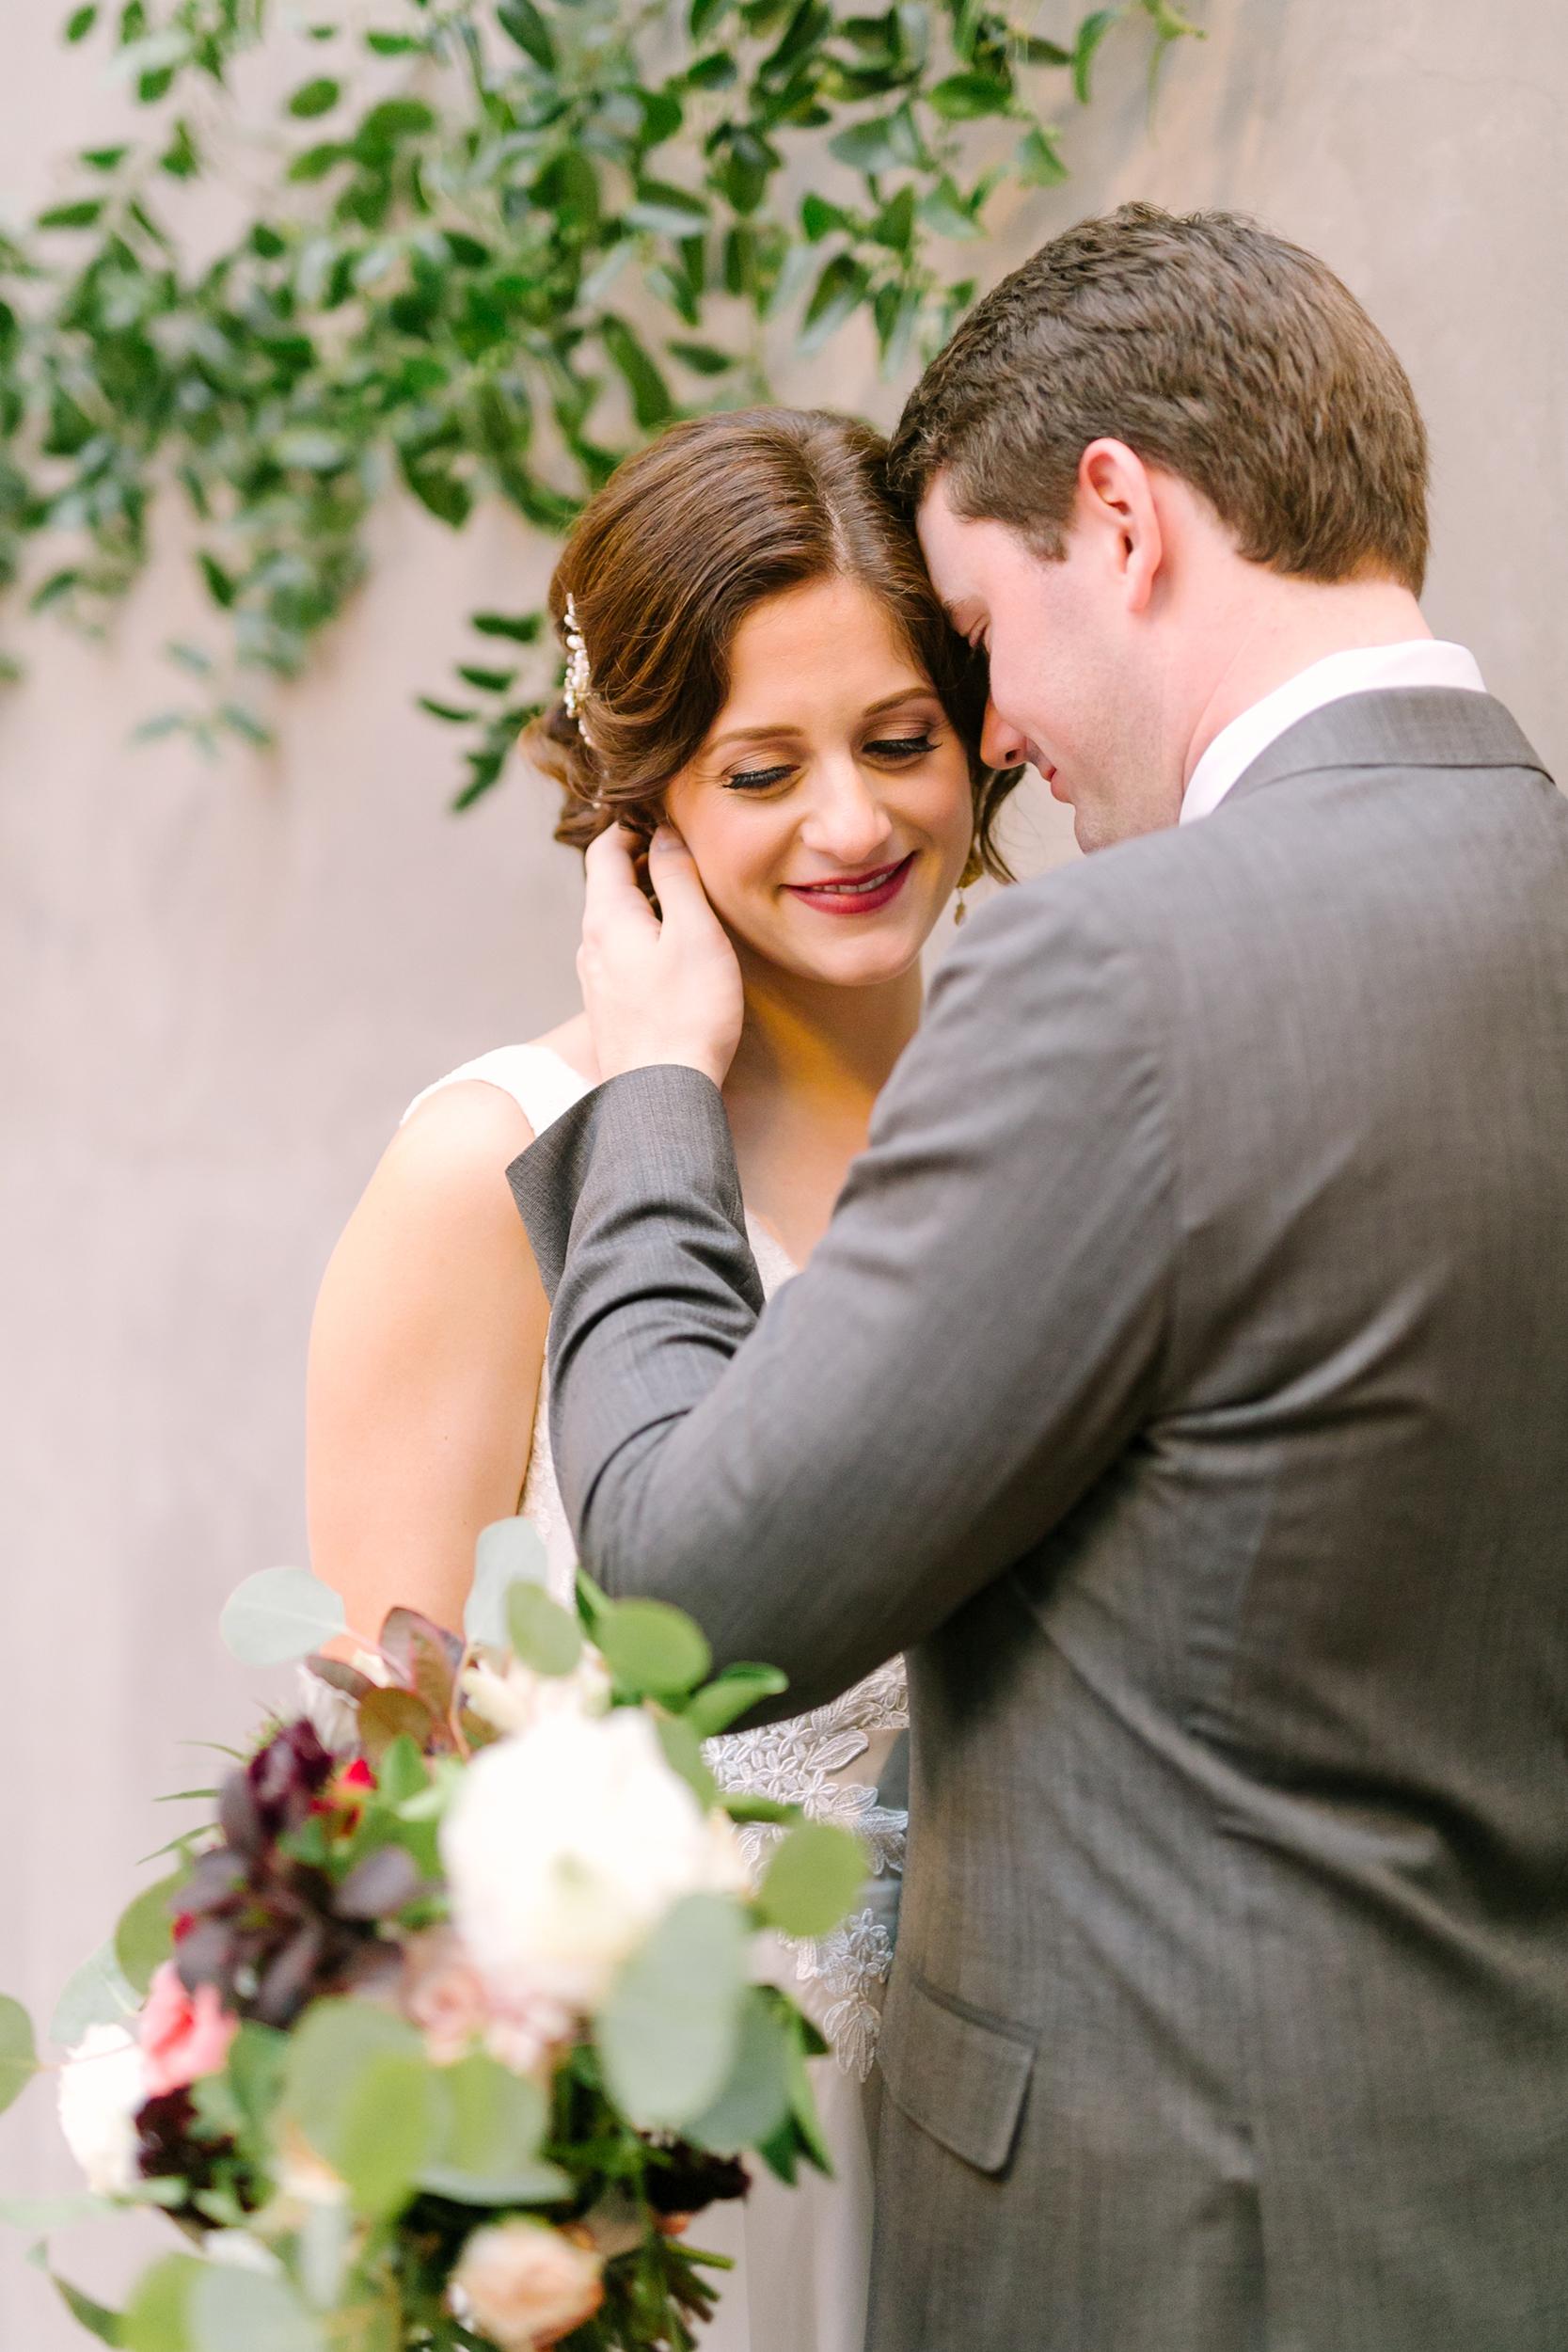 Austin_Wedding_Photographer_Kimberly_Brooke_Photographic_080.jpg